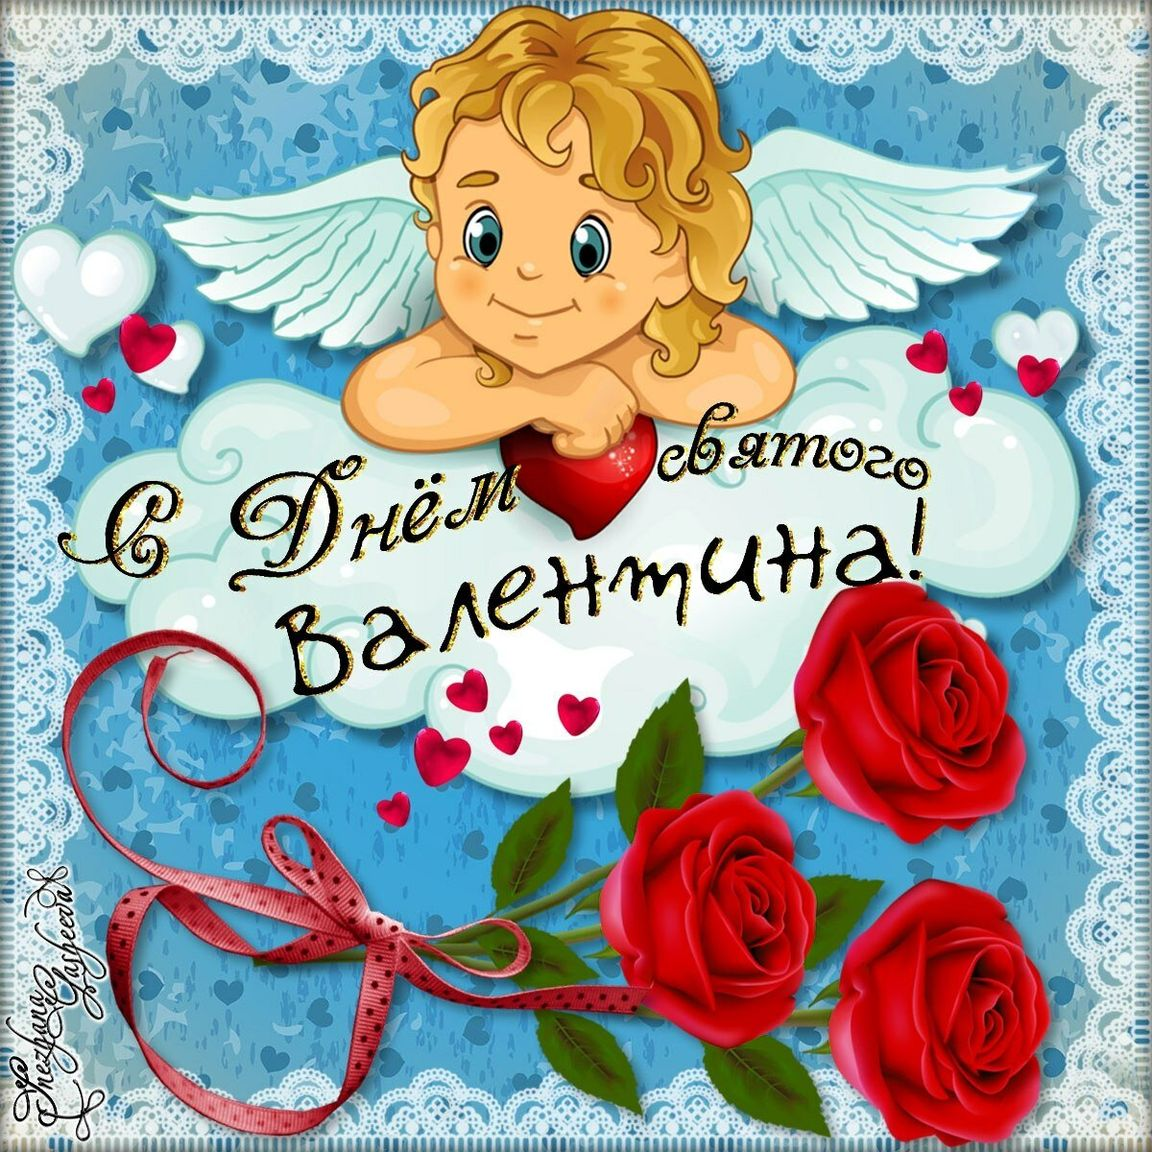 Картинки и пожелания с днем святого валентина